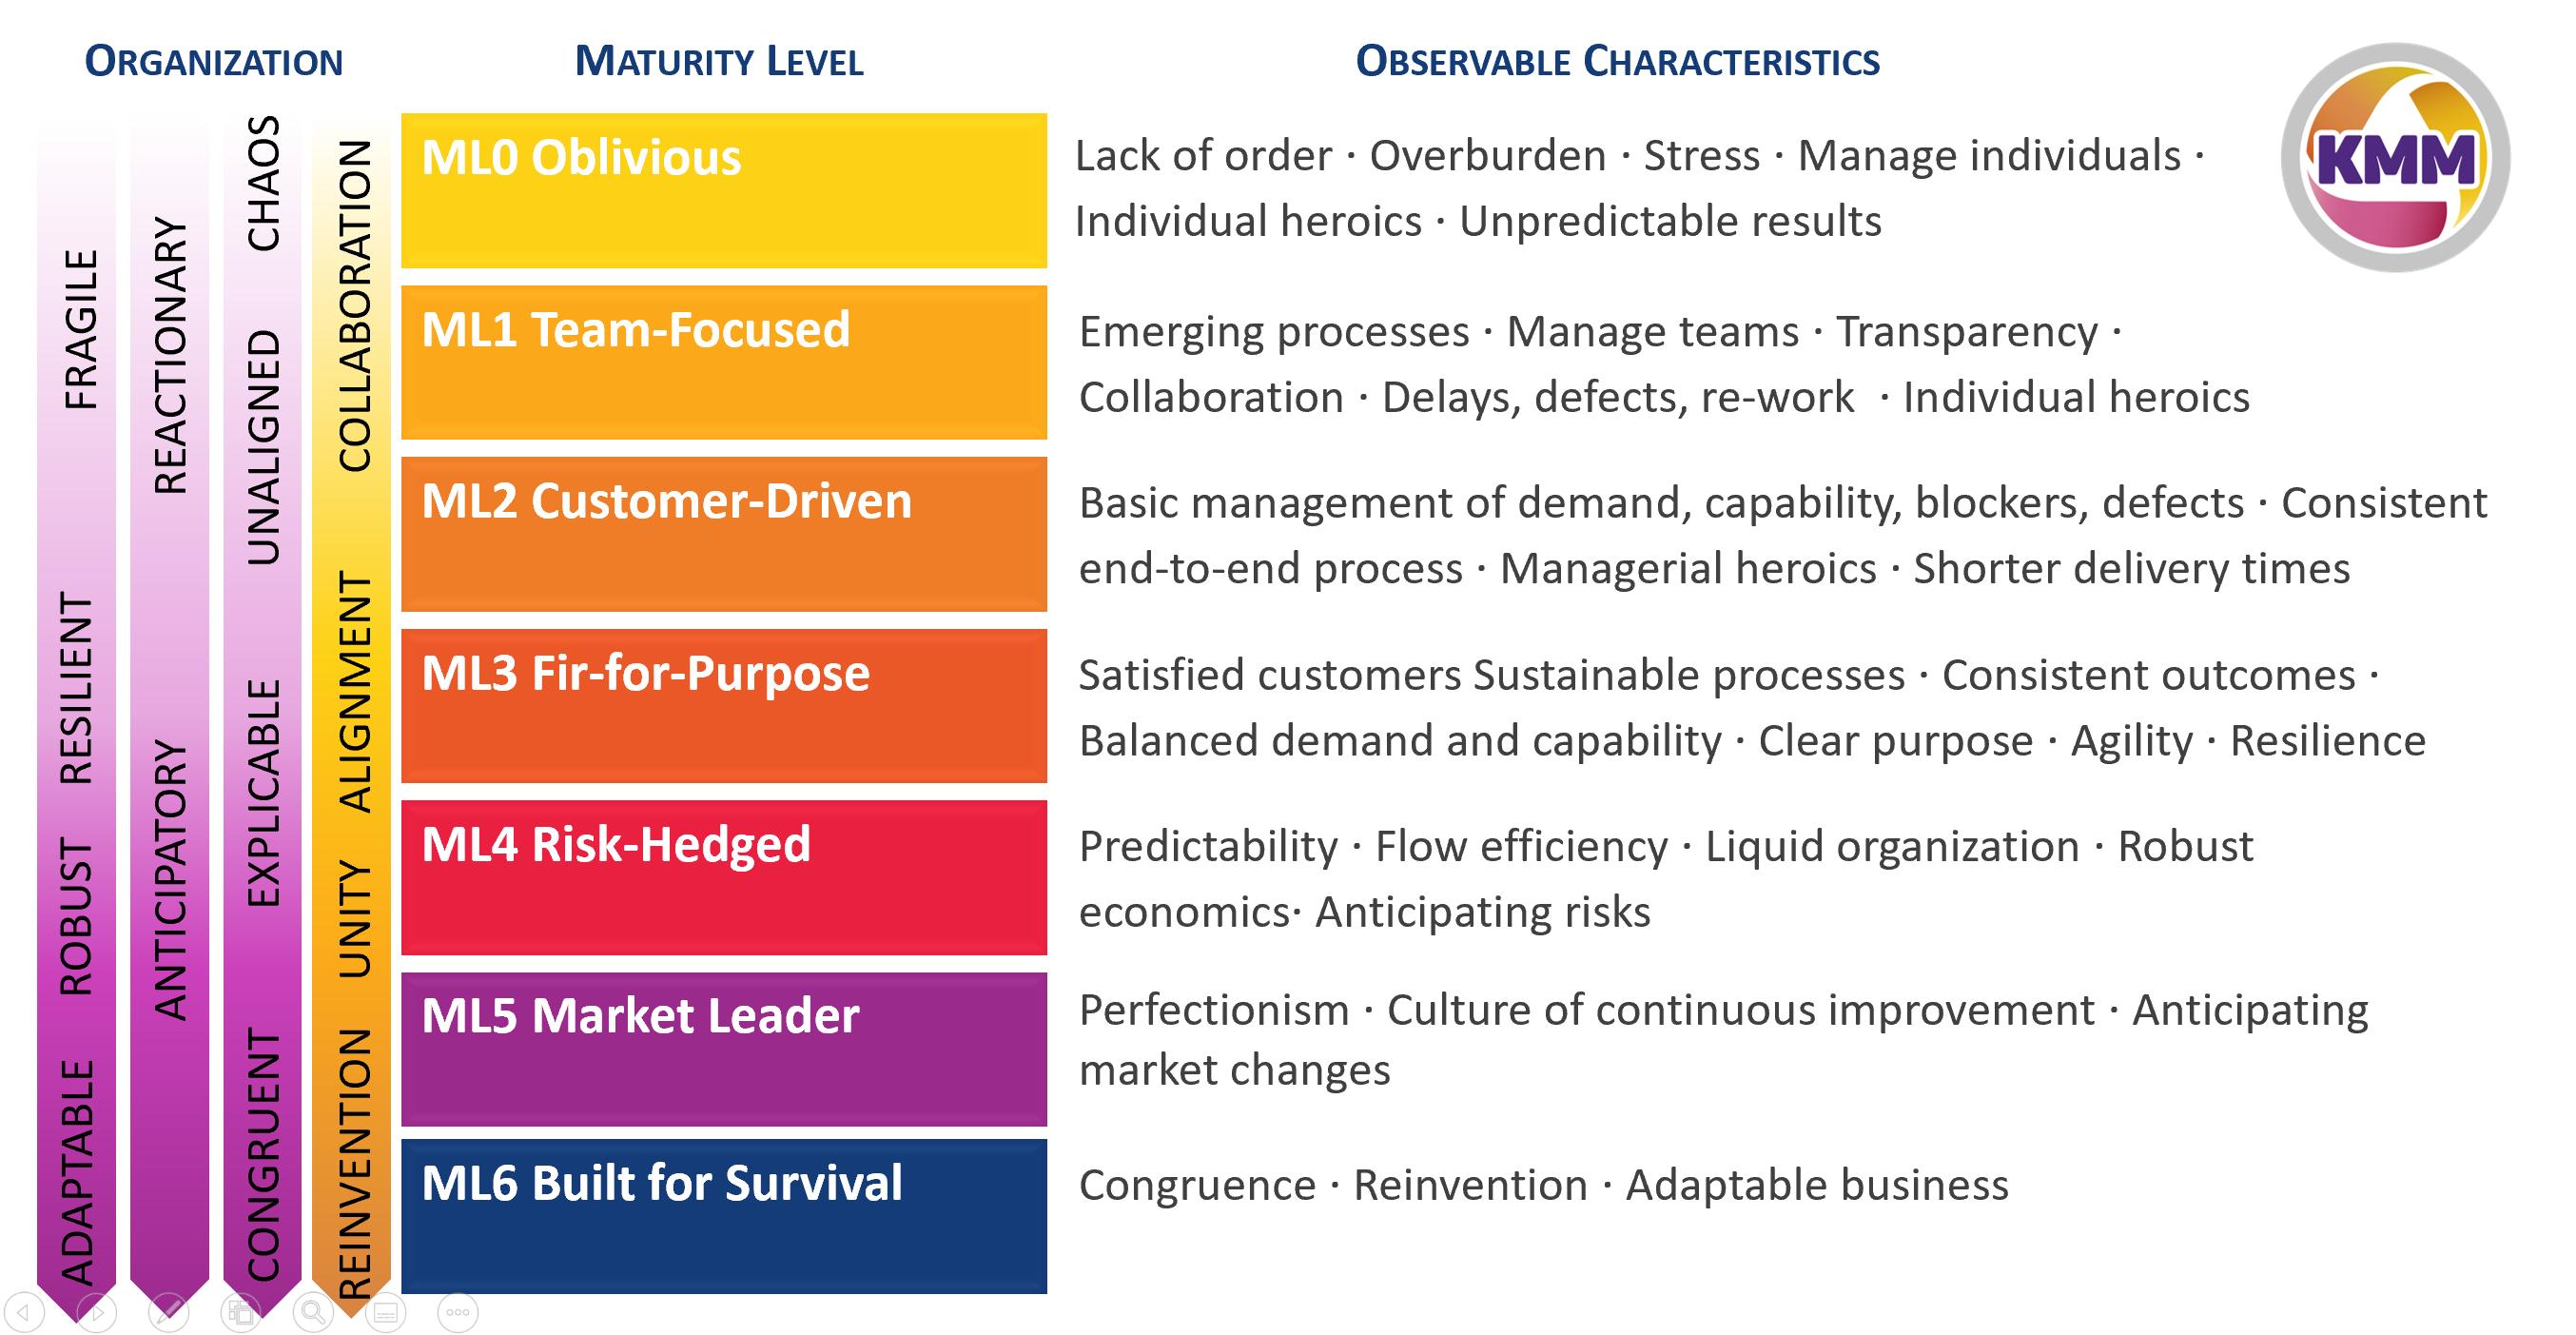 characteristics of Maturity Levels